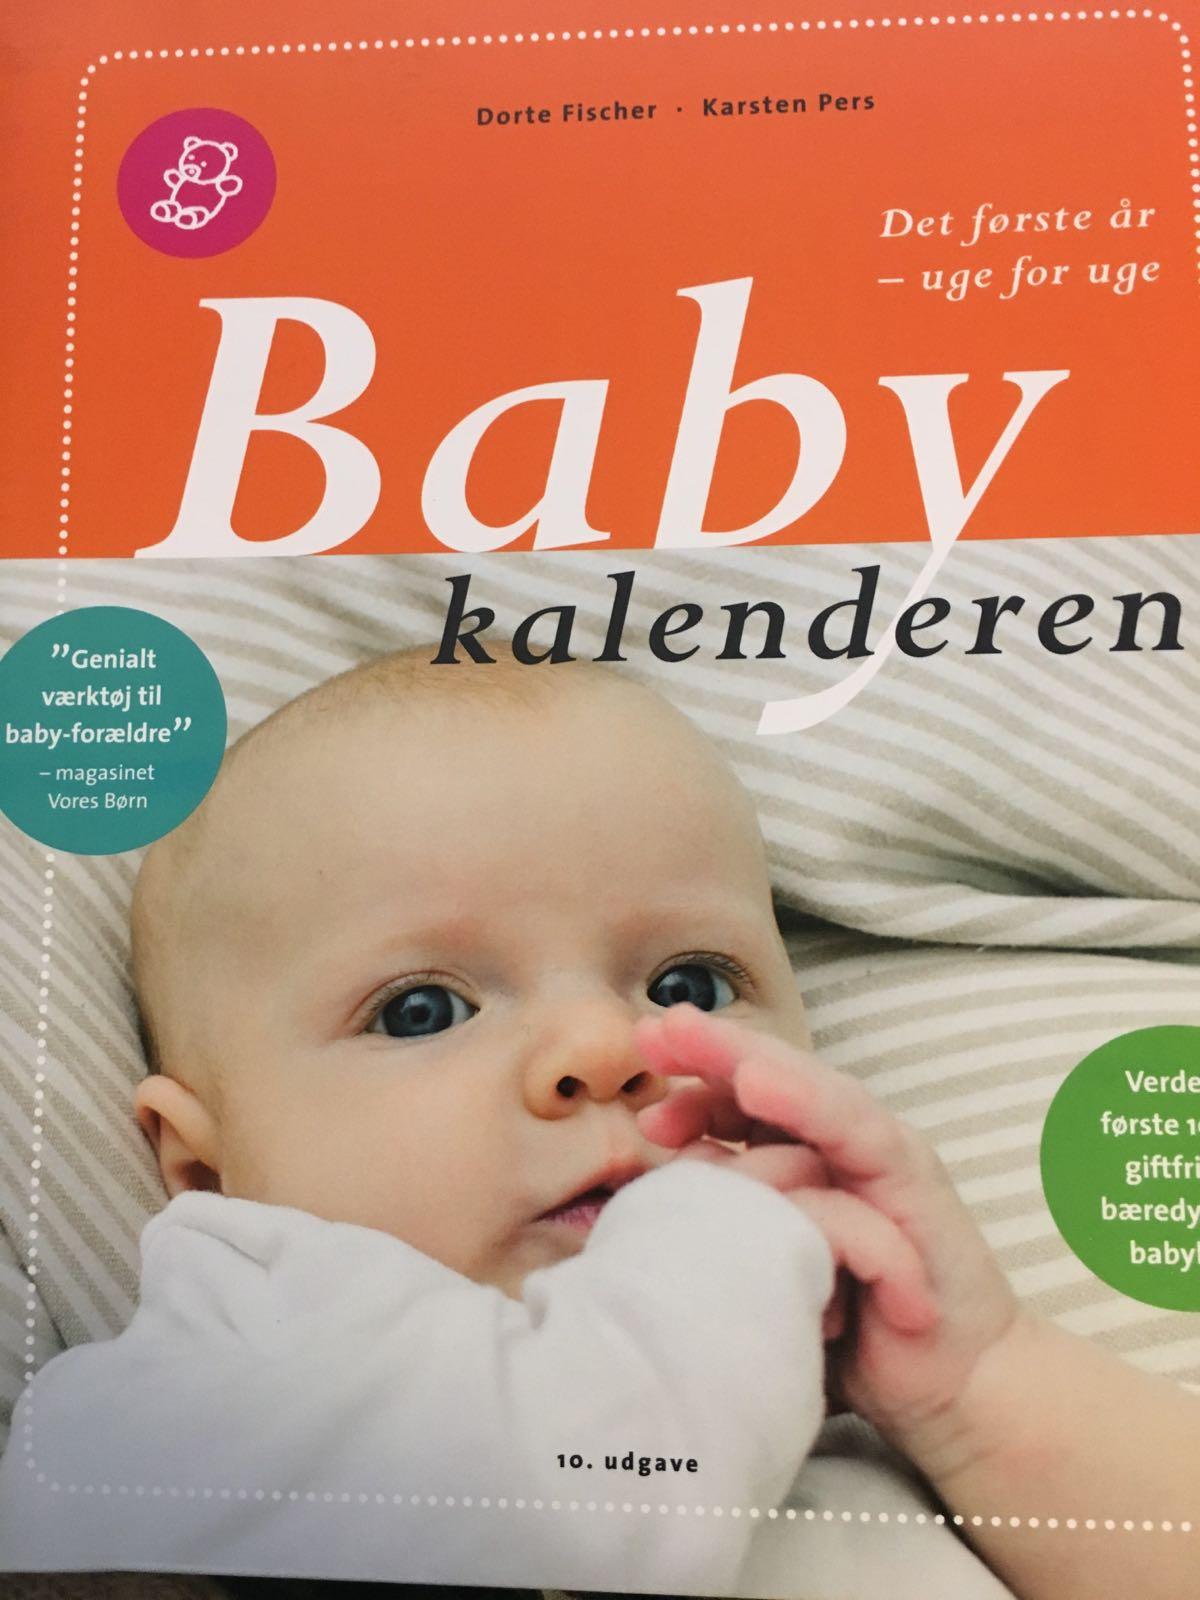 Babykalenderen af Dorte Fischer & Karsten Pers